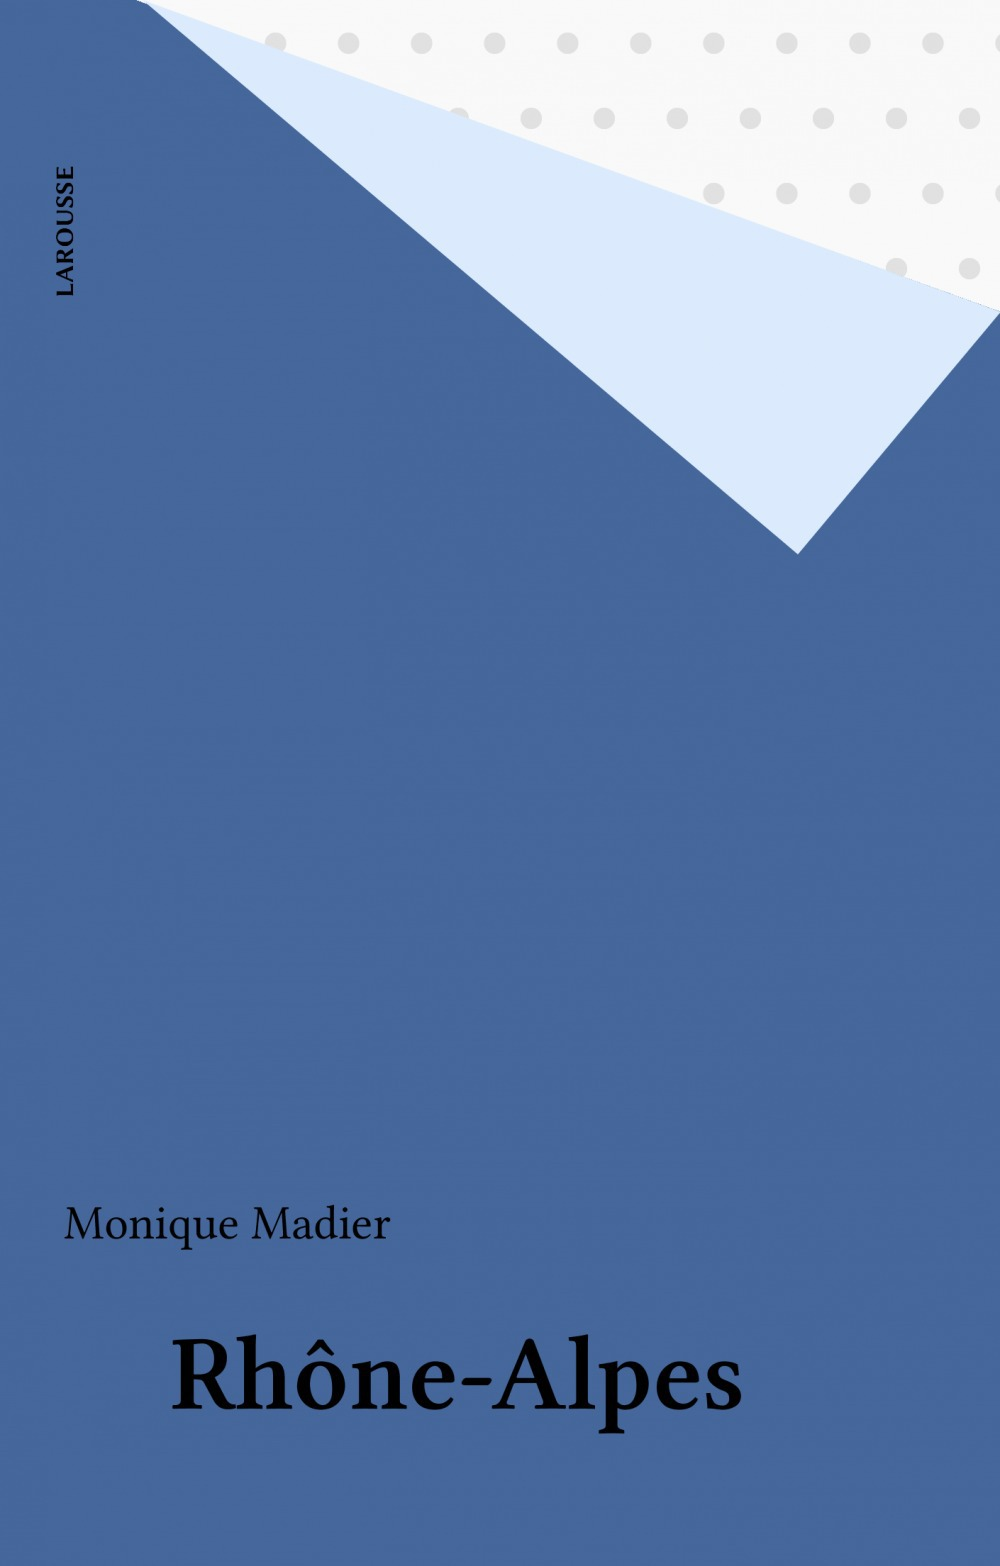 Rhône-Alpes  - Monique Madier